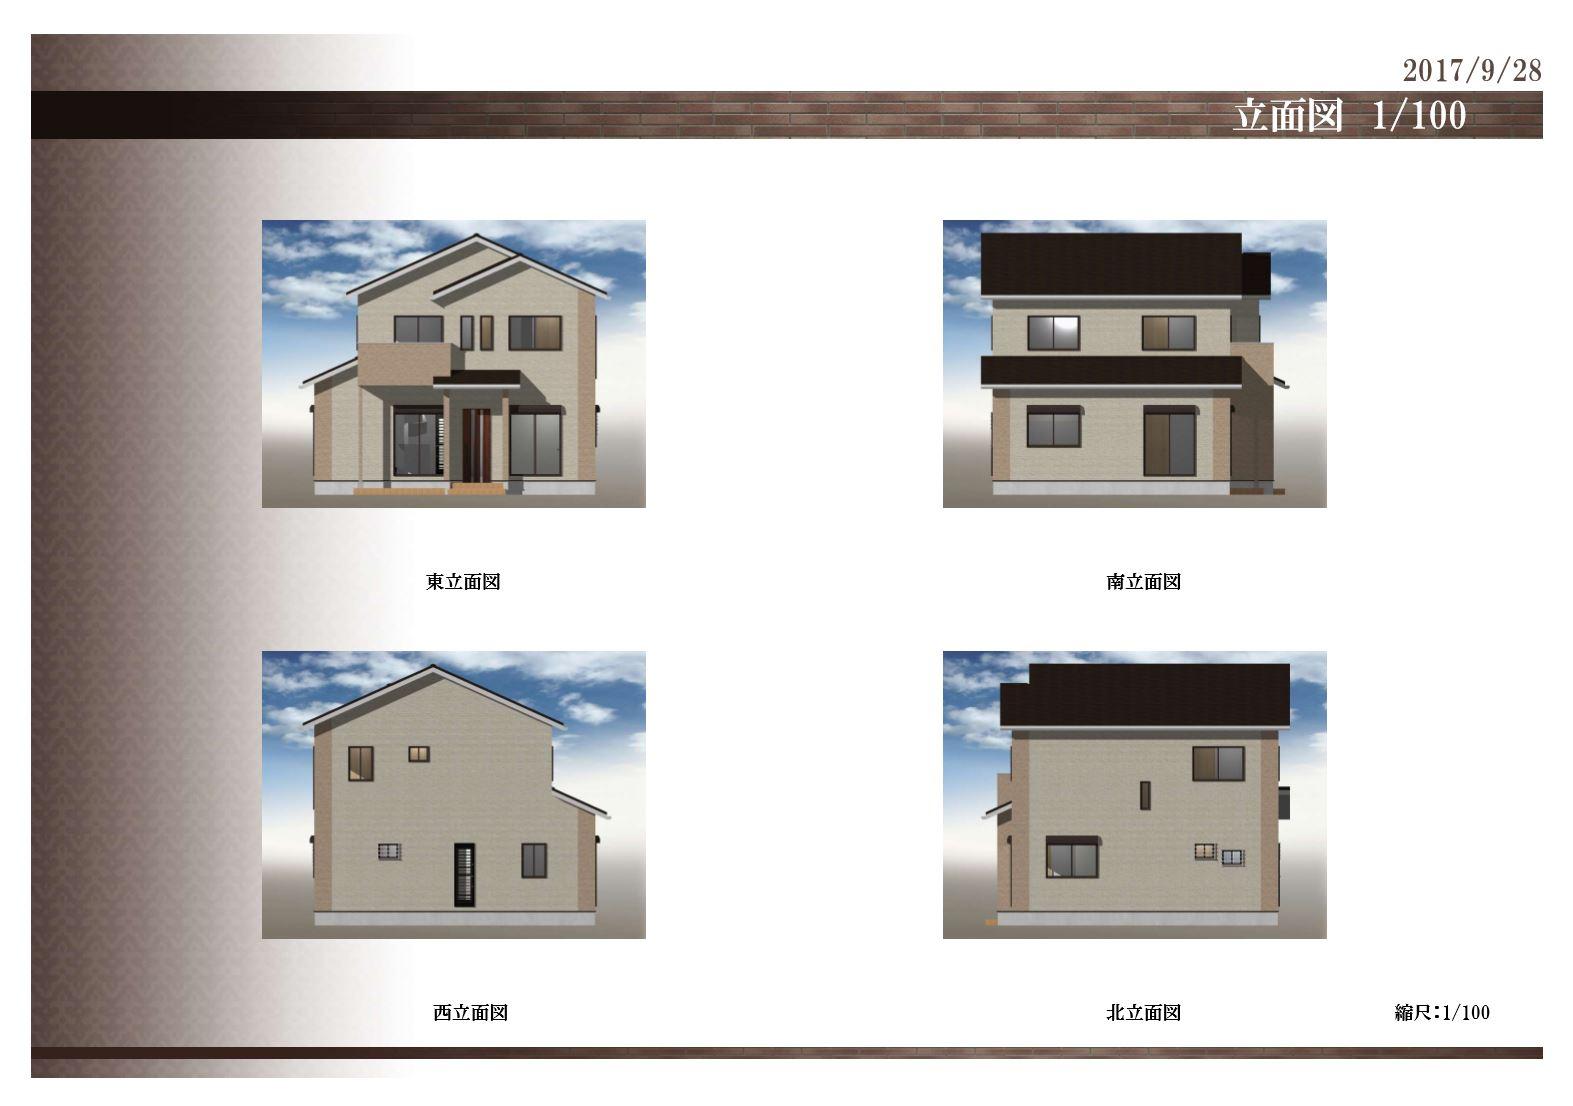 MIYACOCO 外観デザイン 立面図